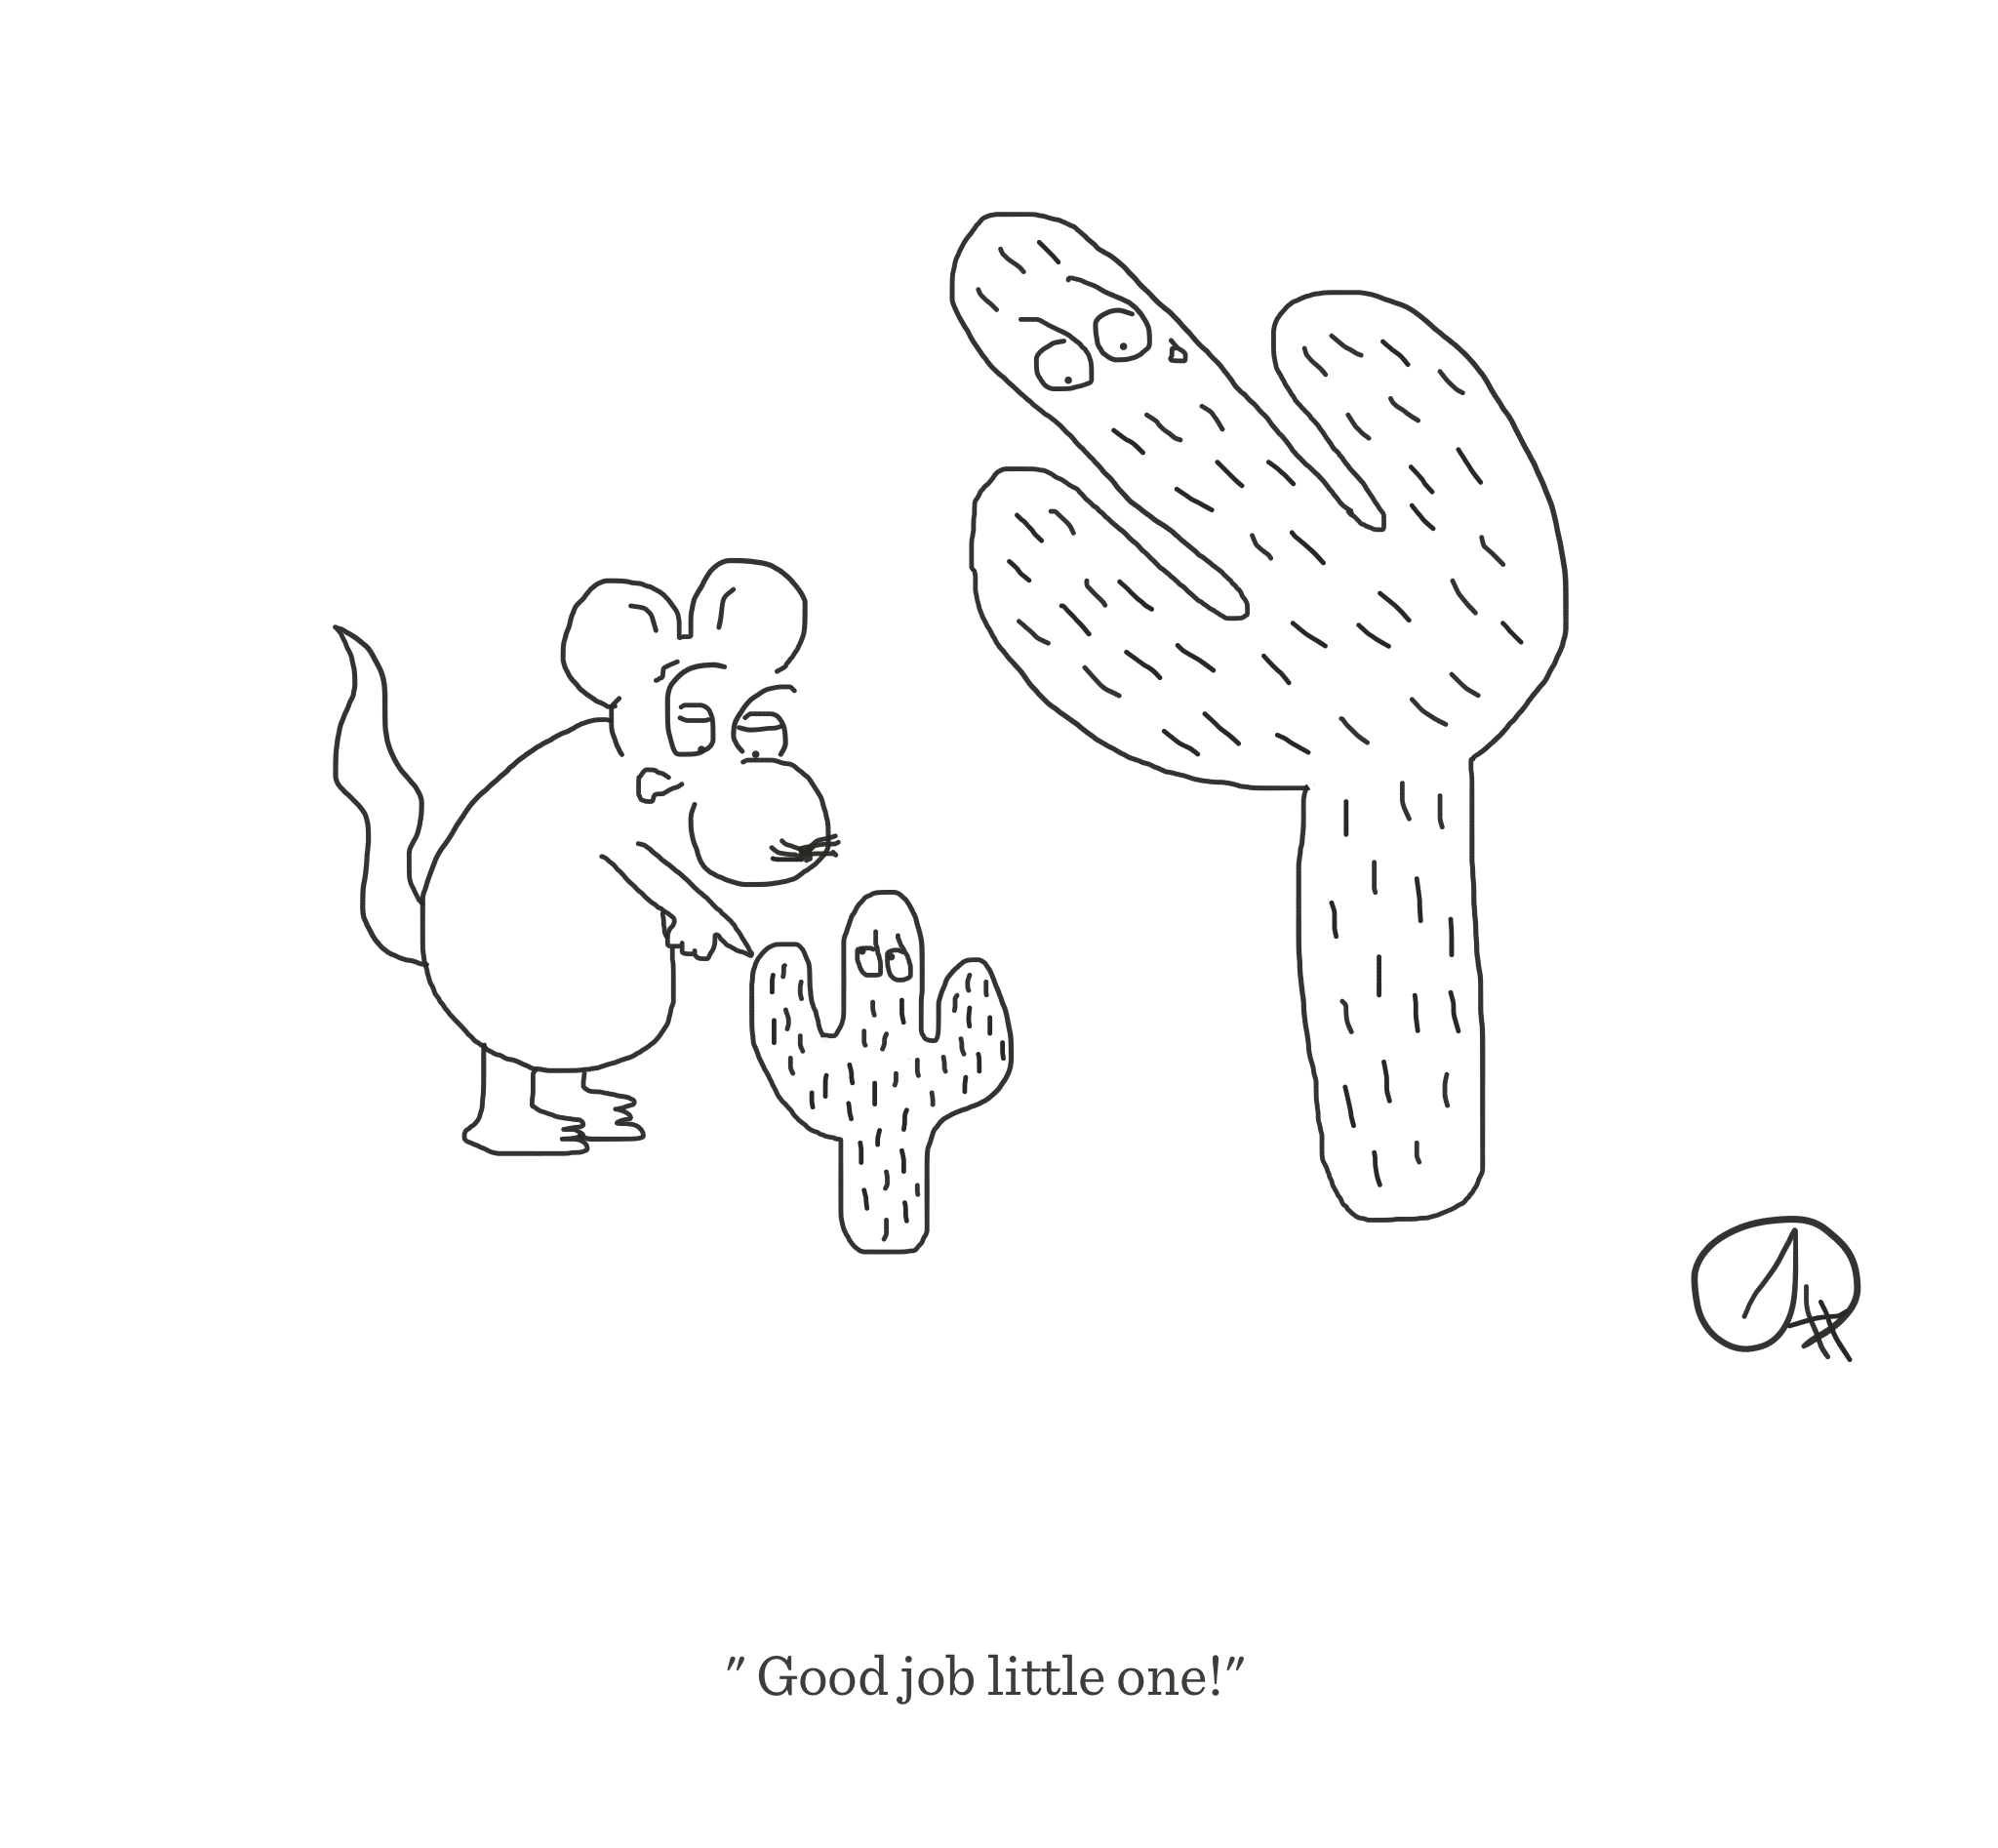 Good job little one, The Happy Rat cartoon